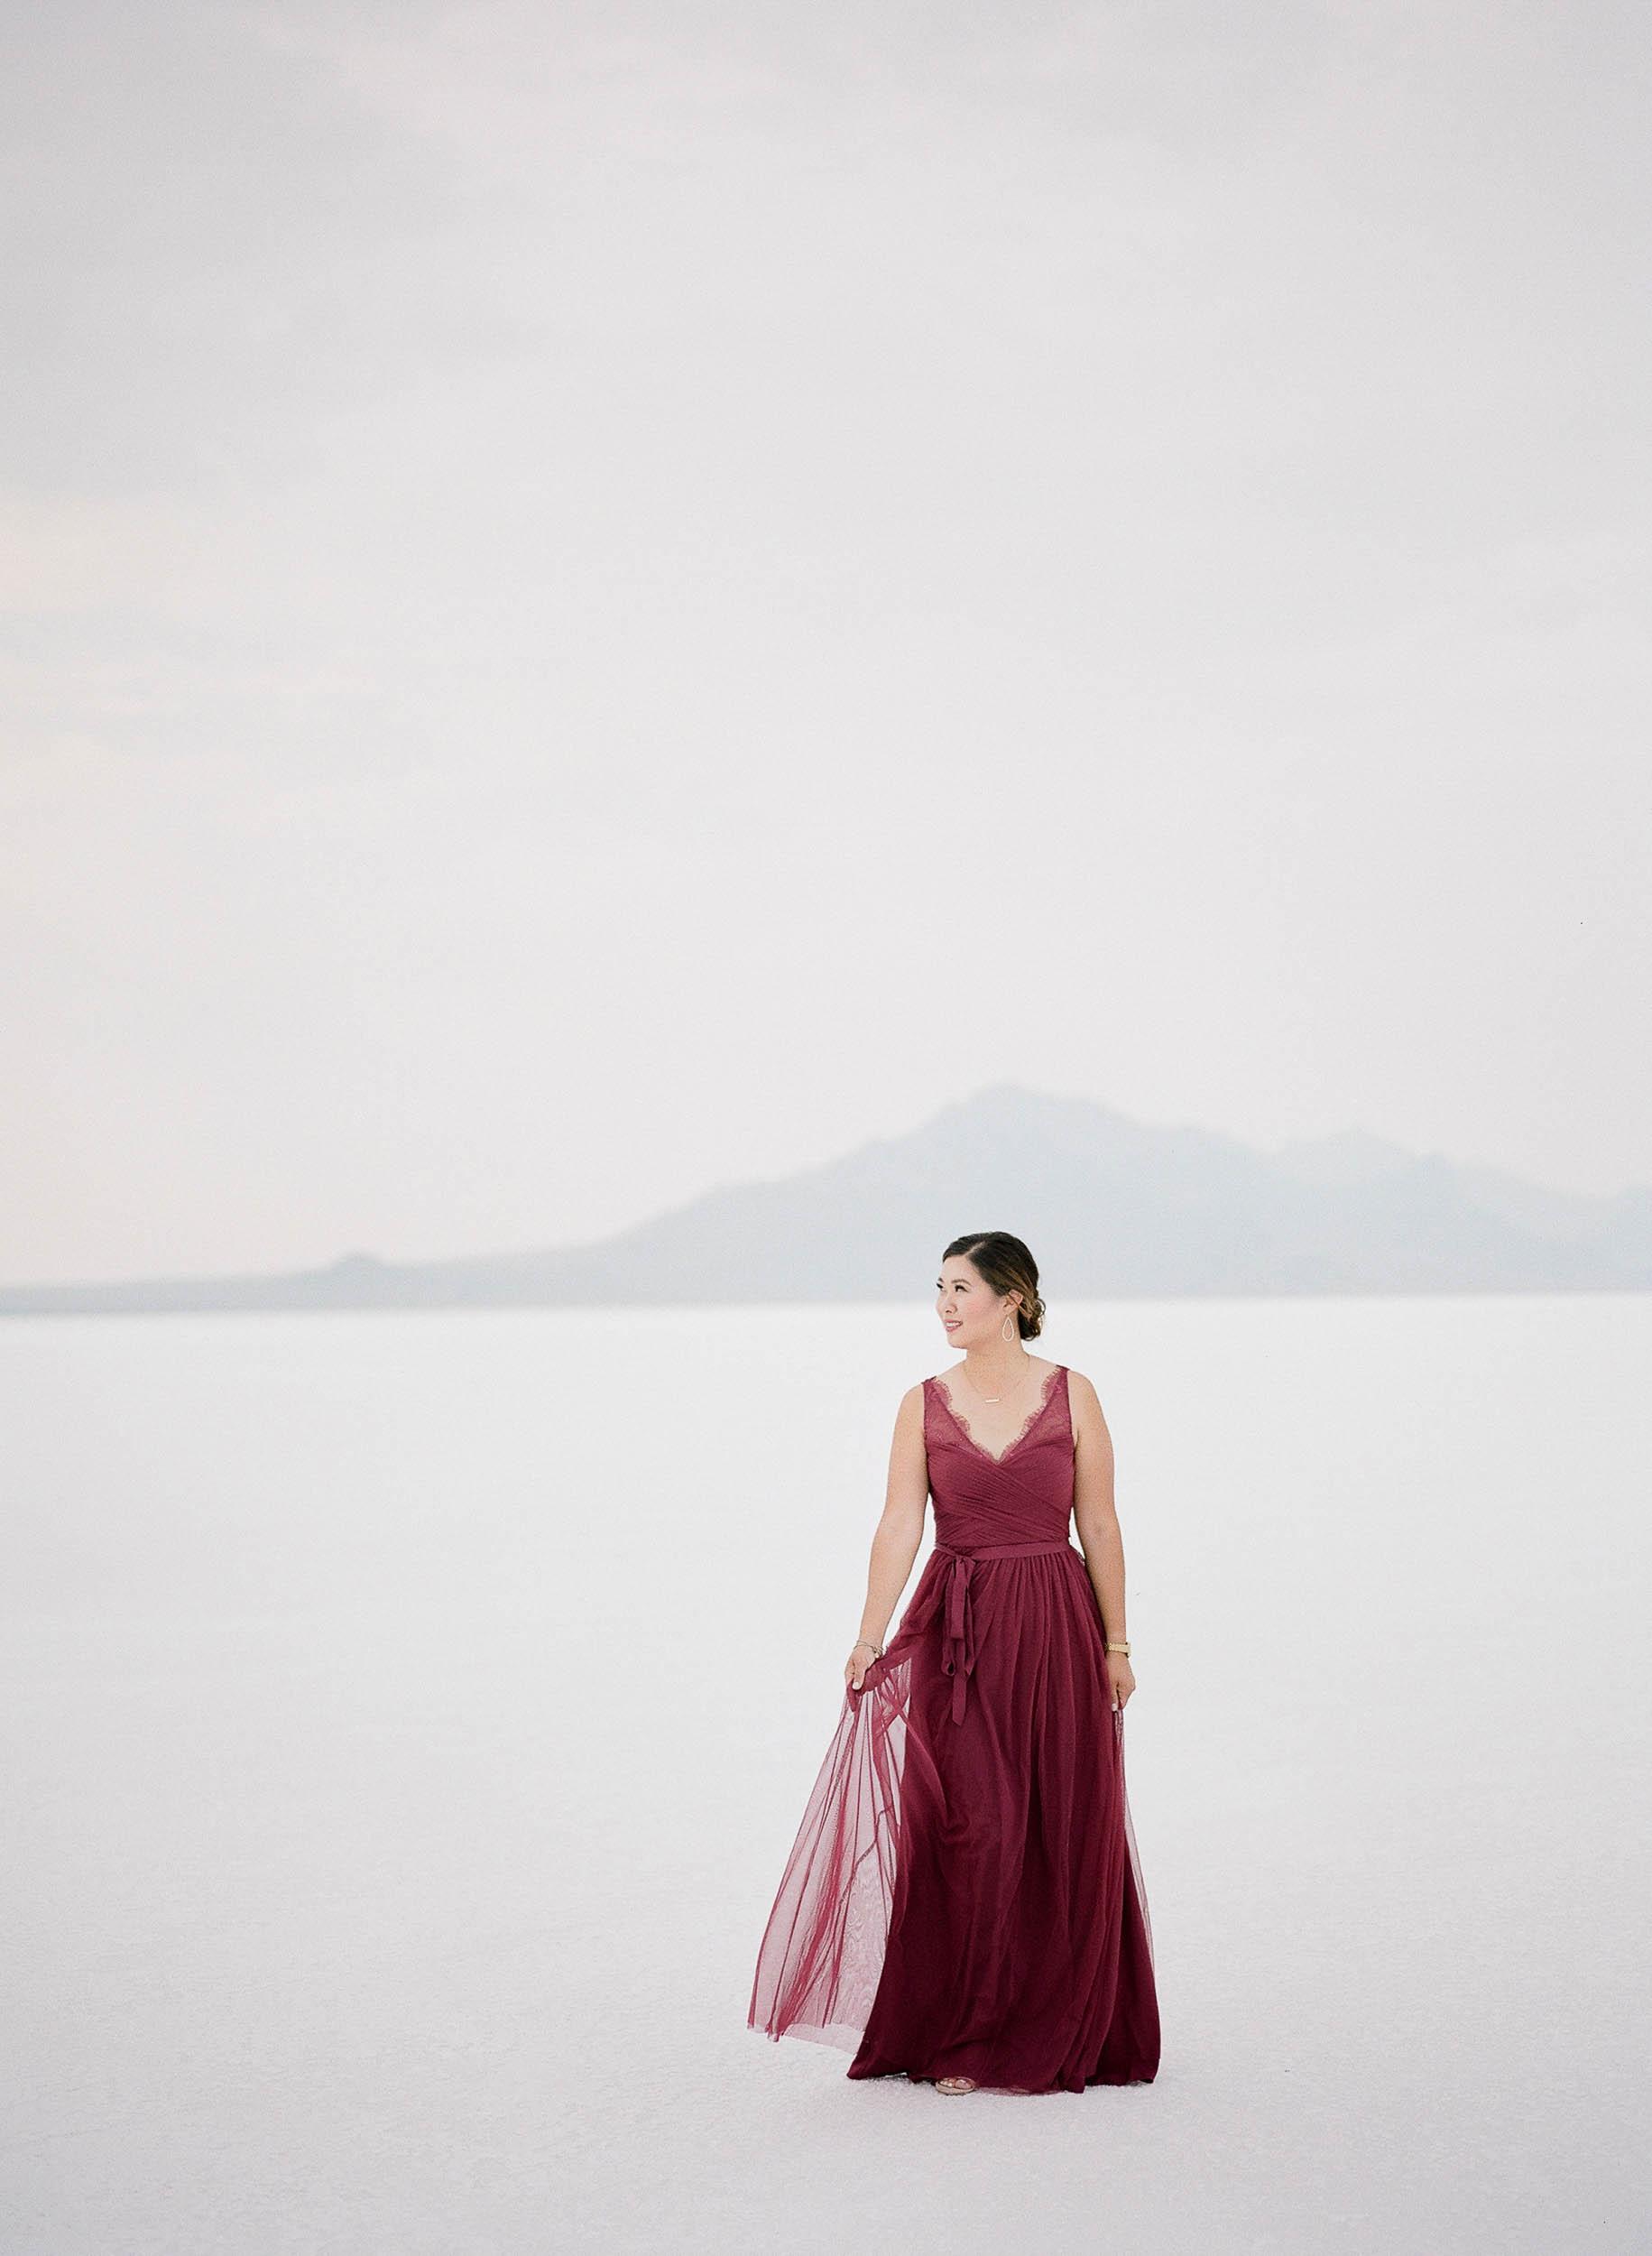 070918_Sandy A La Mode_Family_Utah Salt Flats_Buena Lane Photography_F400_13.jpg